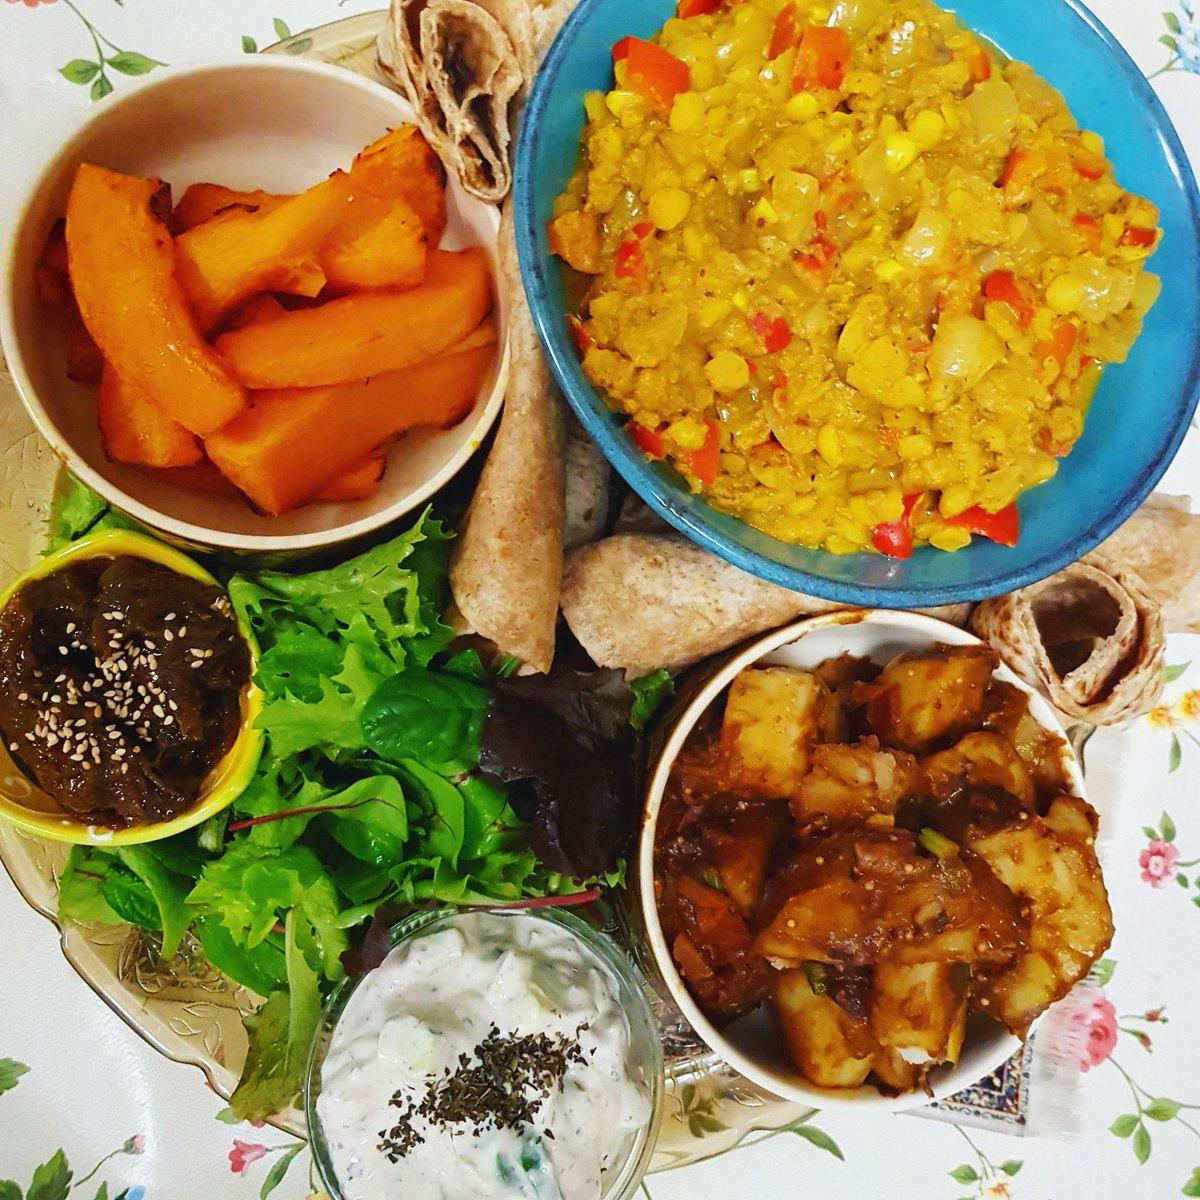 A little mid week (con)fusion 😁 for tonight's dinner: - #daal - roasted #pumkin; - smokey molasses & tamarind potatoes; - rhubarb chutney from @Tinkadventures - raita, salad & chapatis.  🥘🎃🥔🥗🥯  #Veganism #veganfood #CrueltyFree #instafood #Veganuary #Veganuary2021